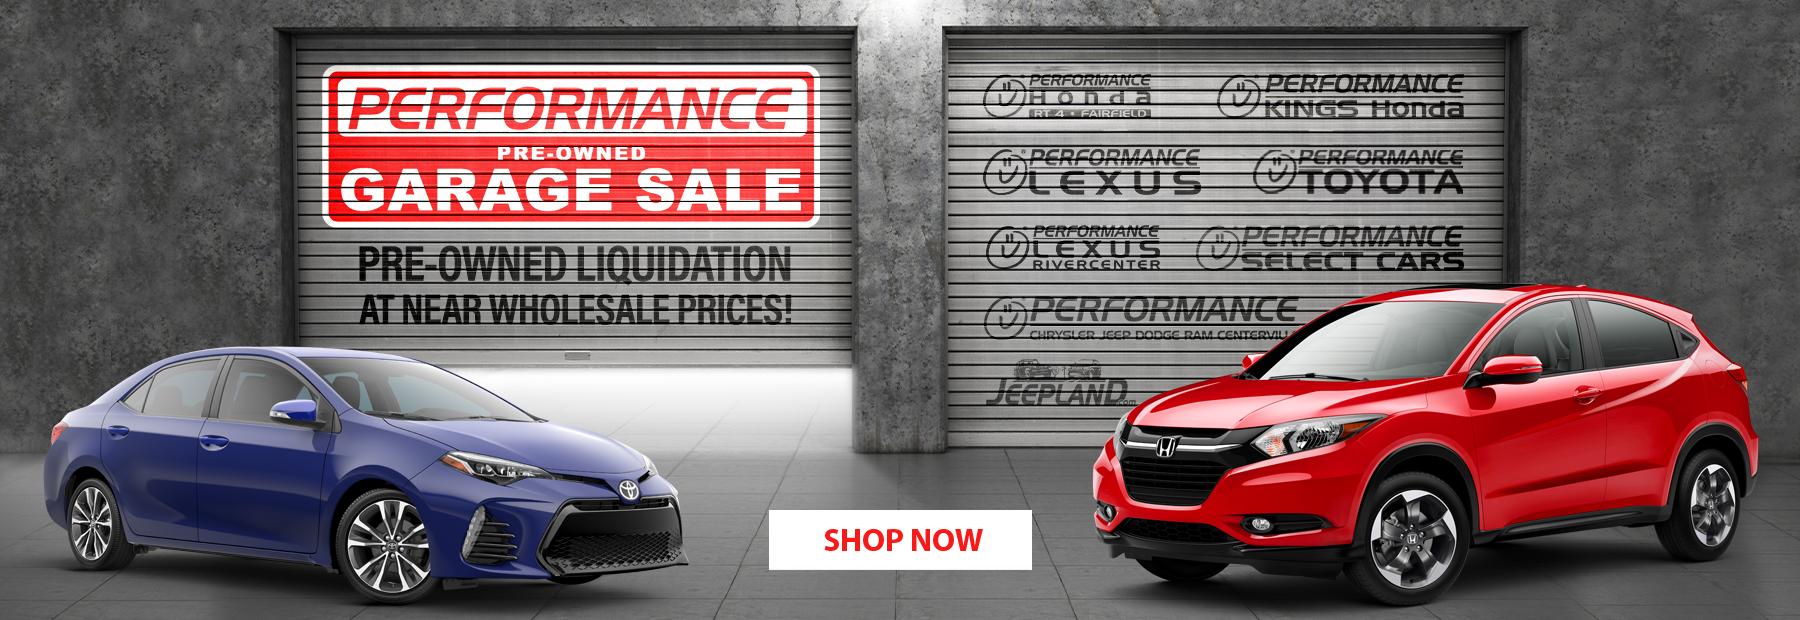 Performance Used Car Garage Sale